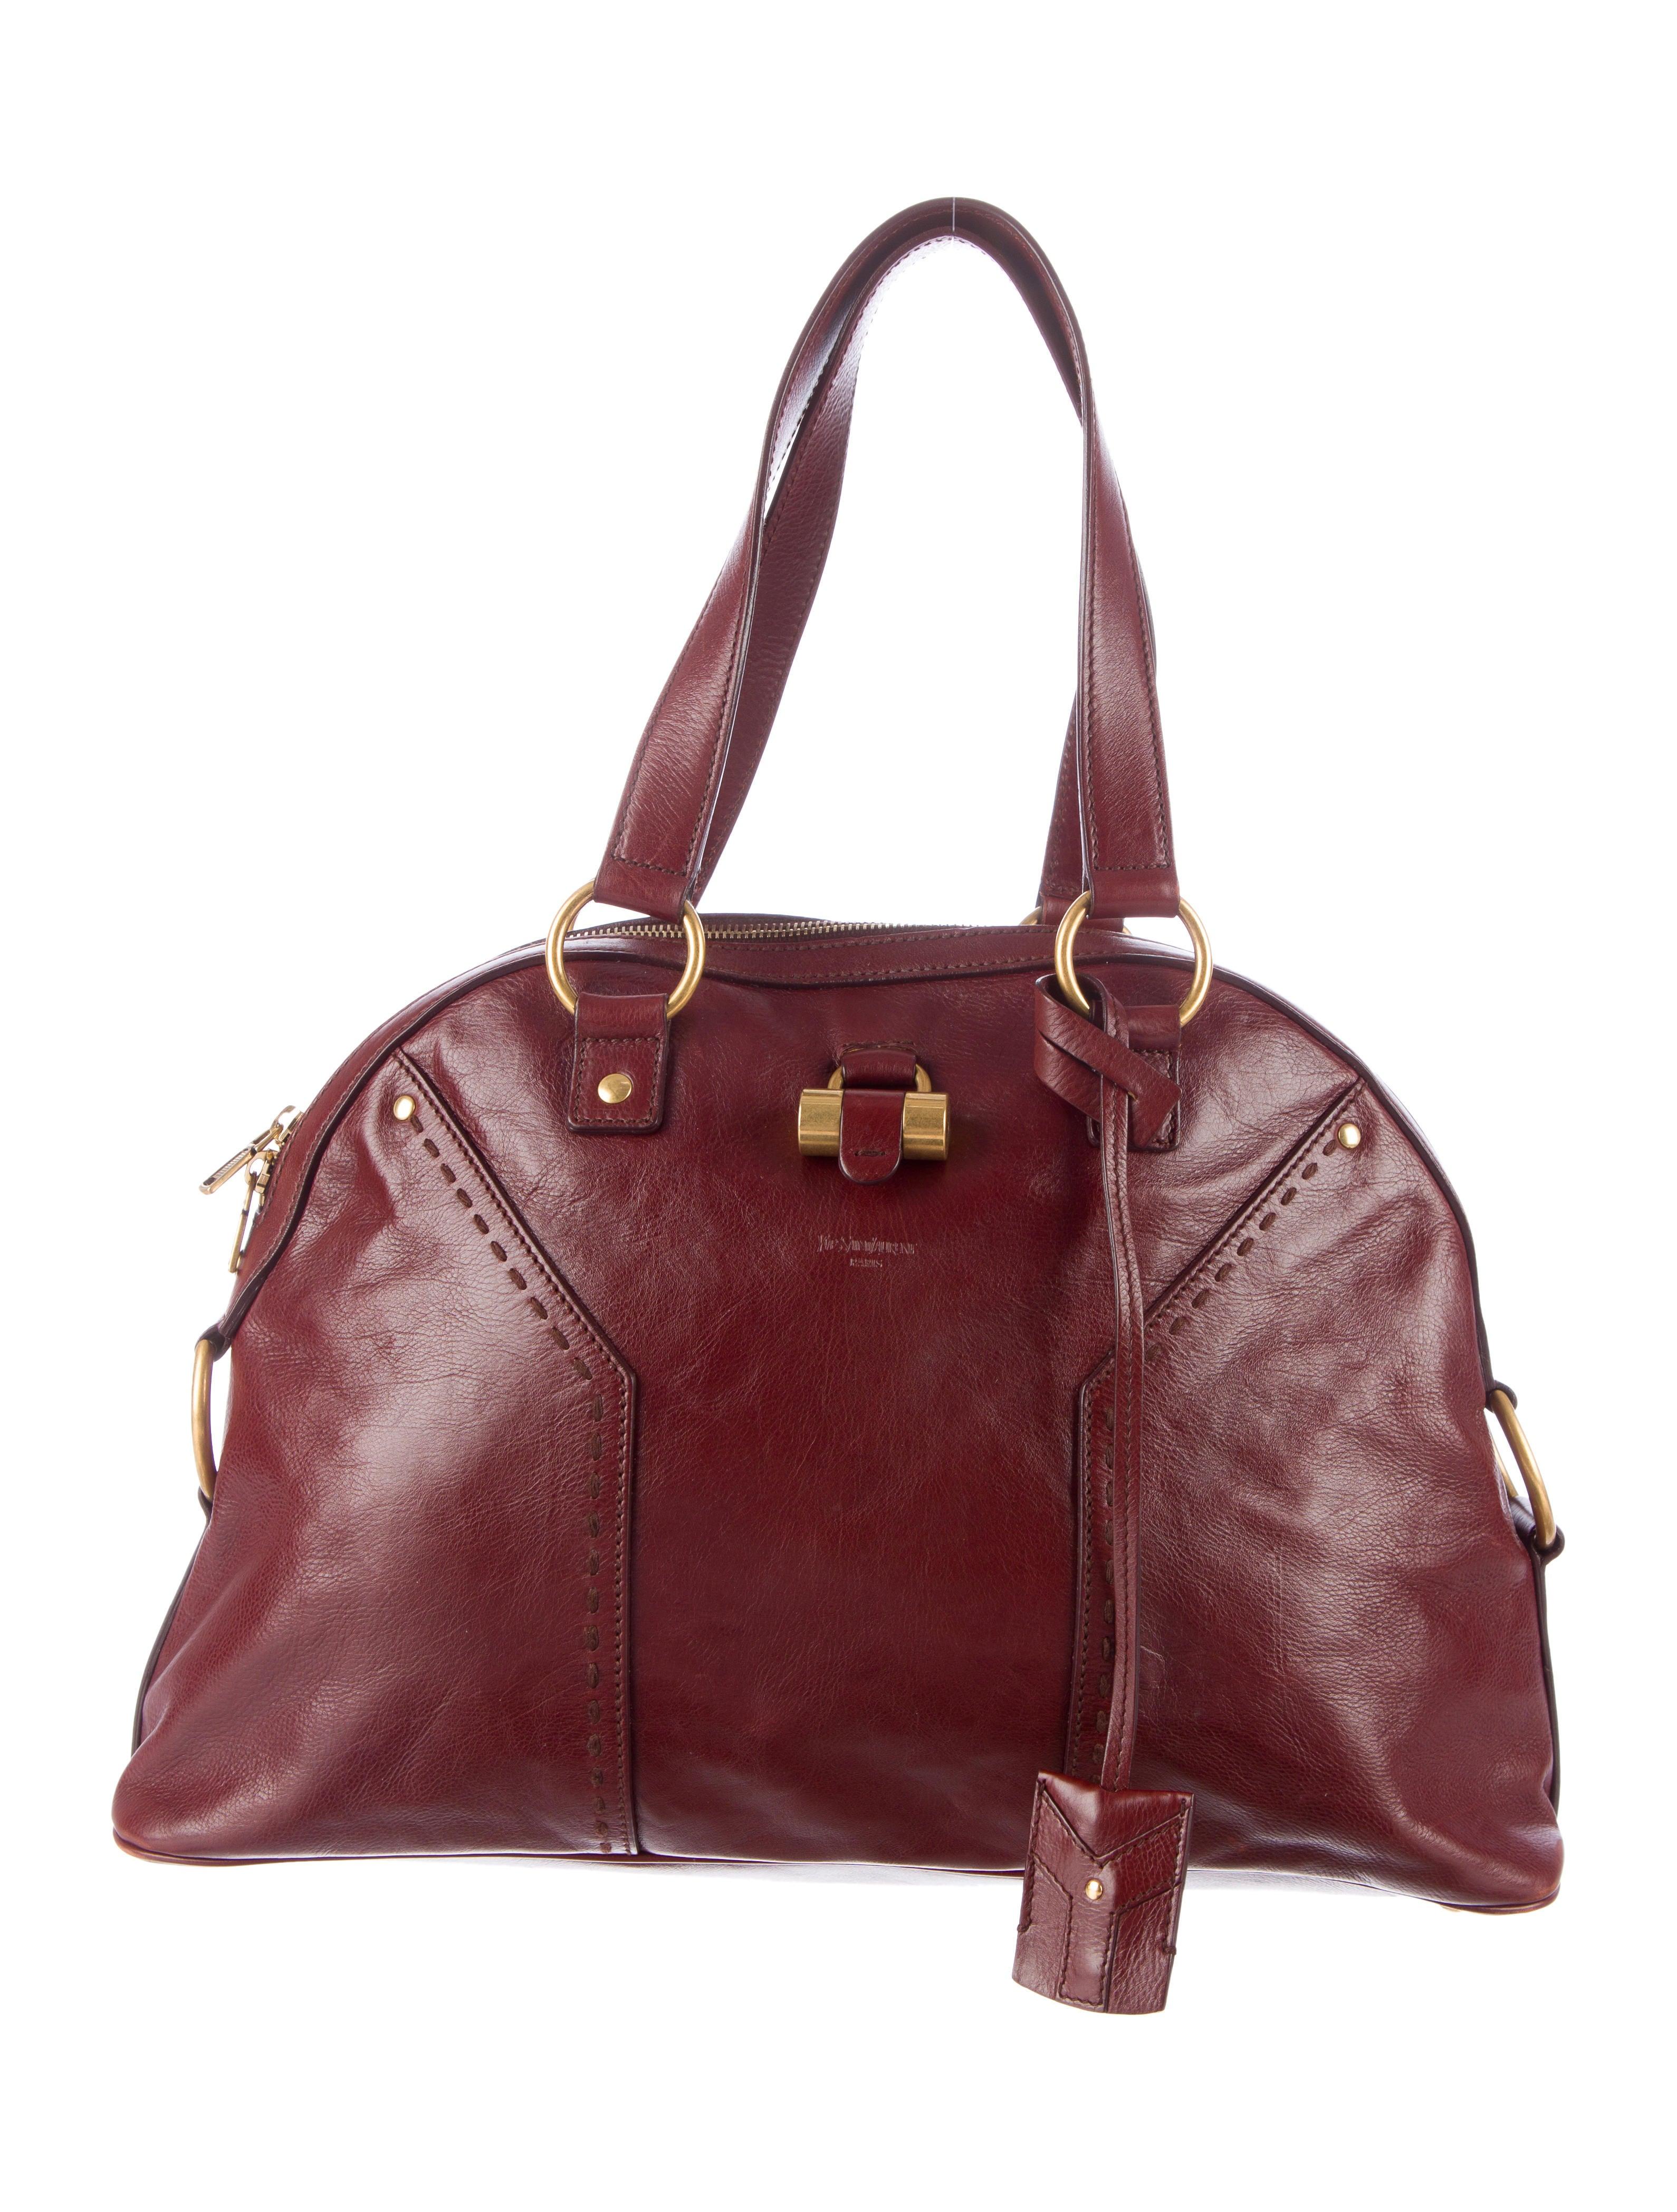 ysl tassel clutch replica - Yves Saint Laurent Mini Muse Bag - Handbags - YVE37383 | The RealReal